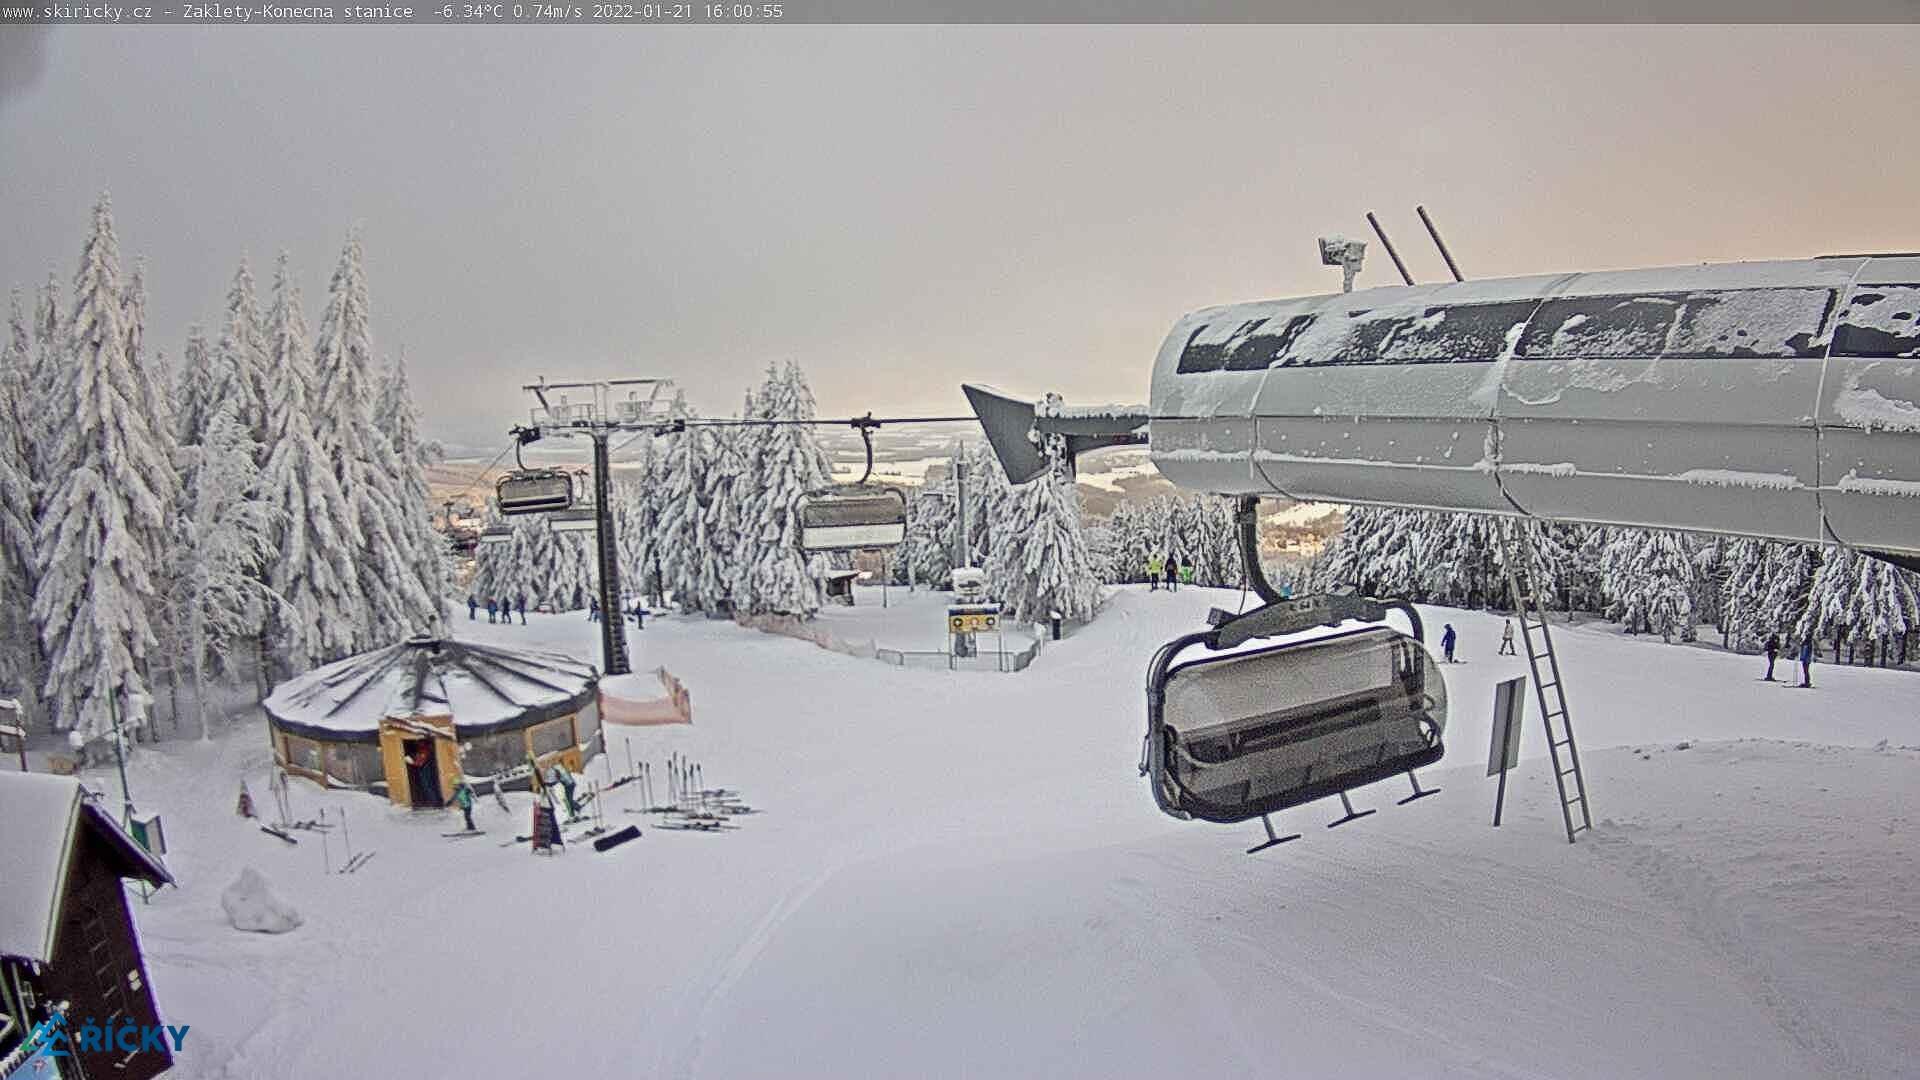 Webcam Skigebiet Ricky v O.h. Ausstieg Sessellift - Adlergebirge